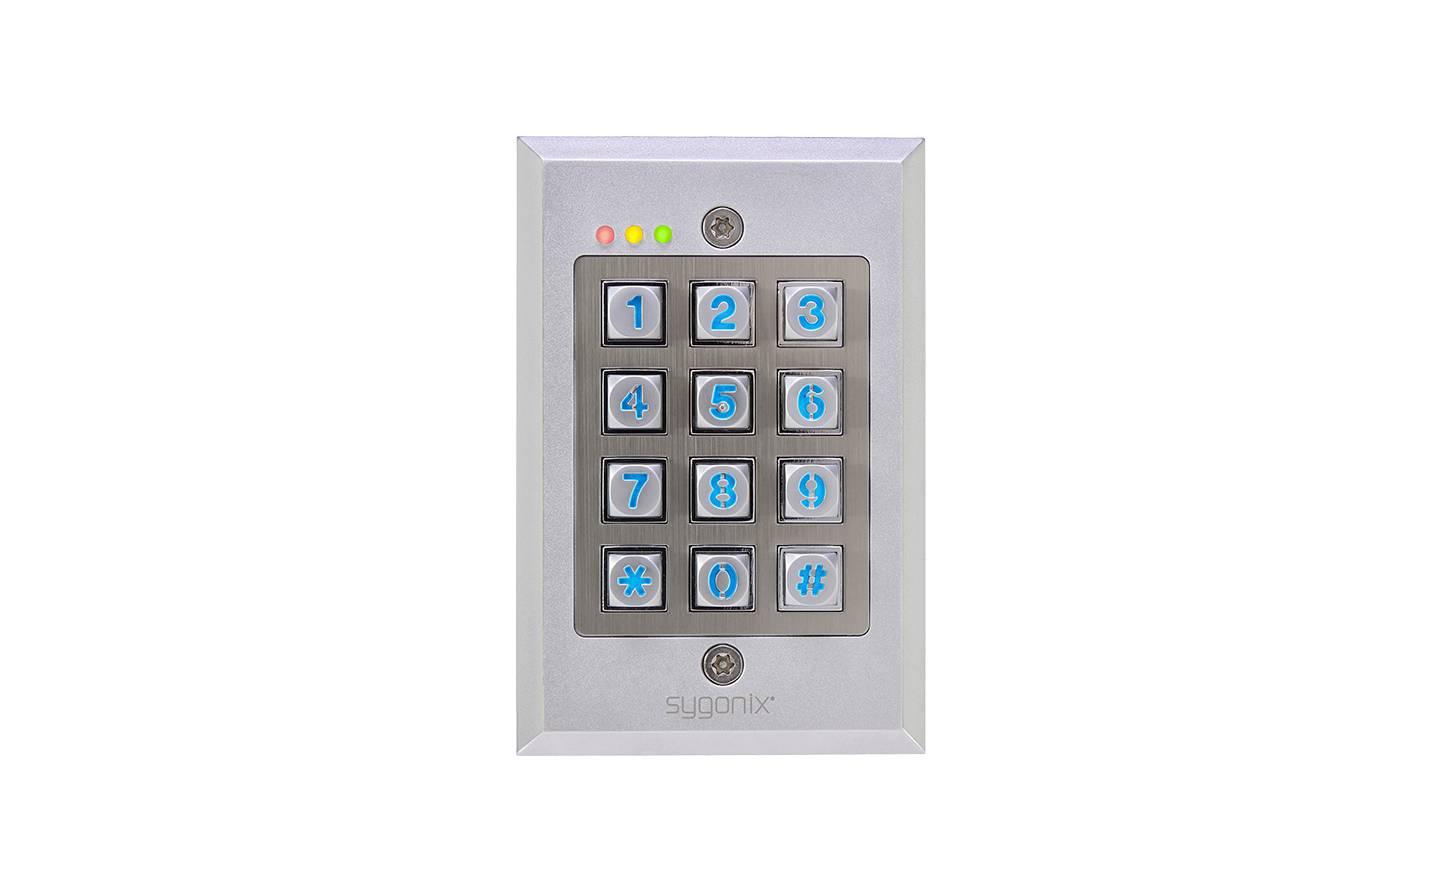 Sygonix - Protection de portes & fenêtres